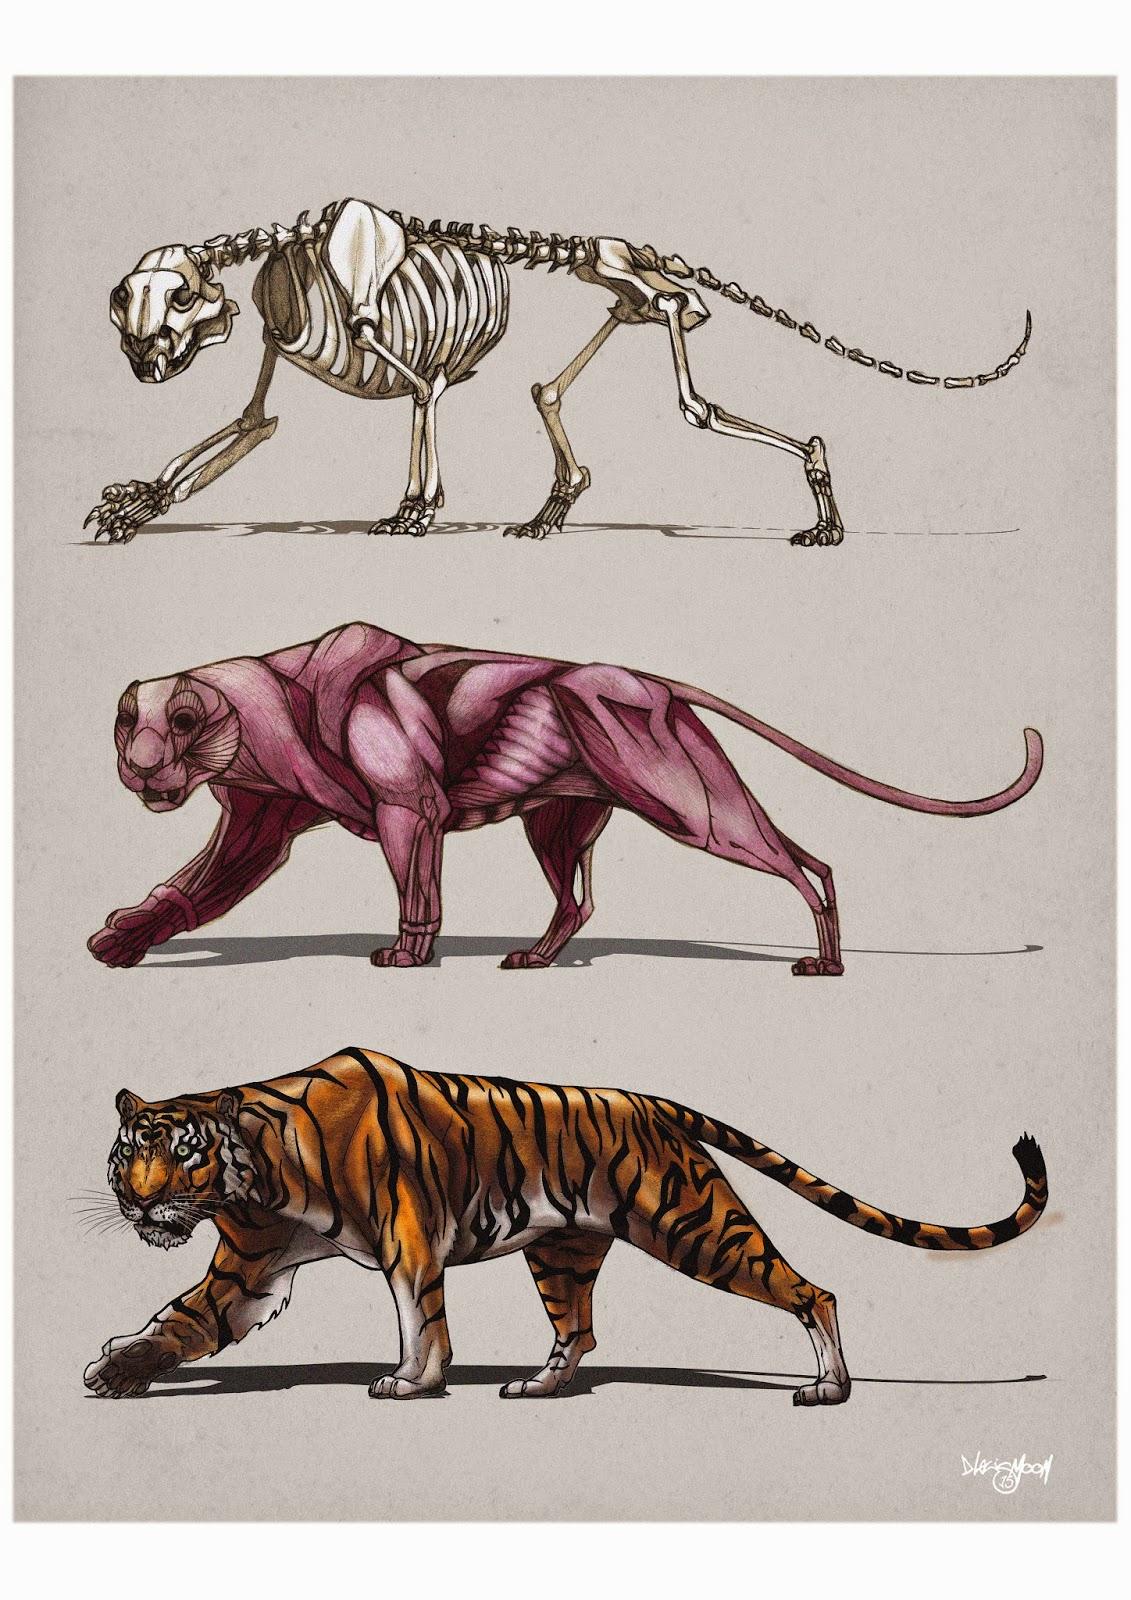 Bear and bigcats anatomy